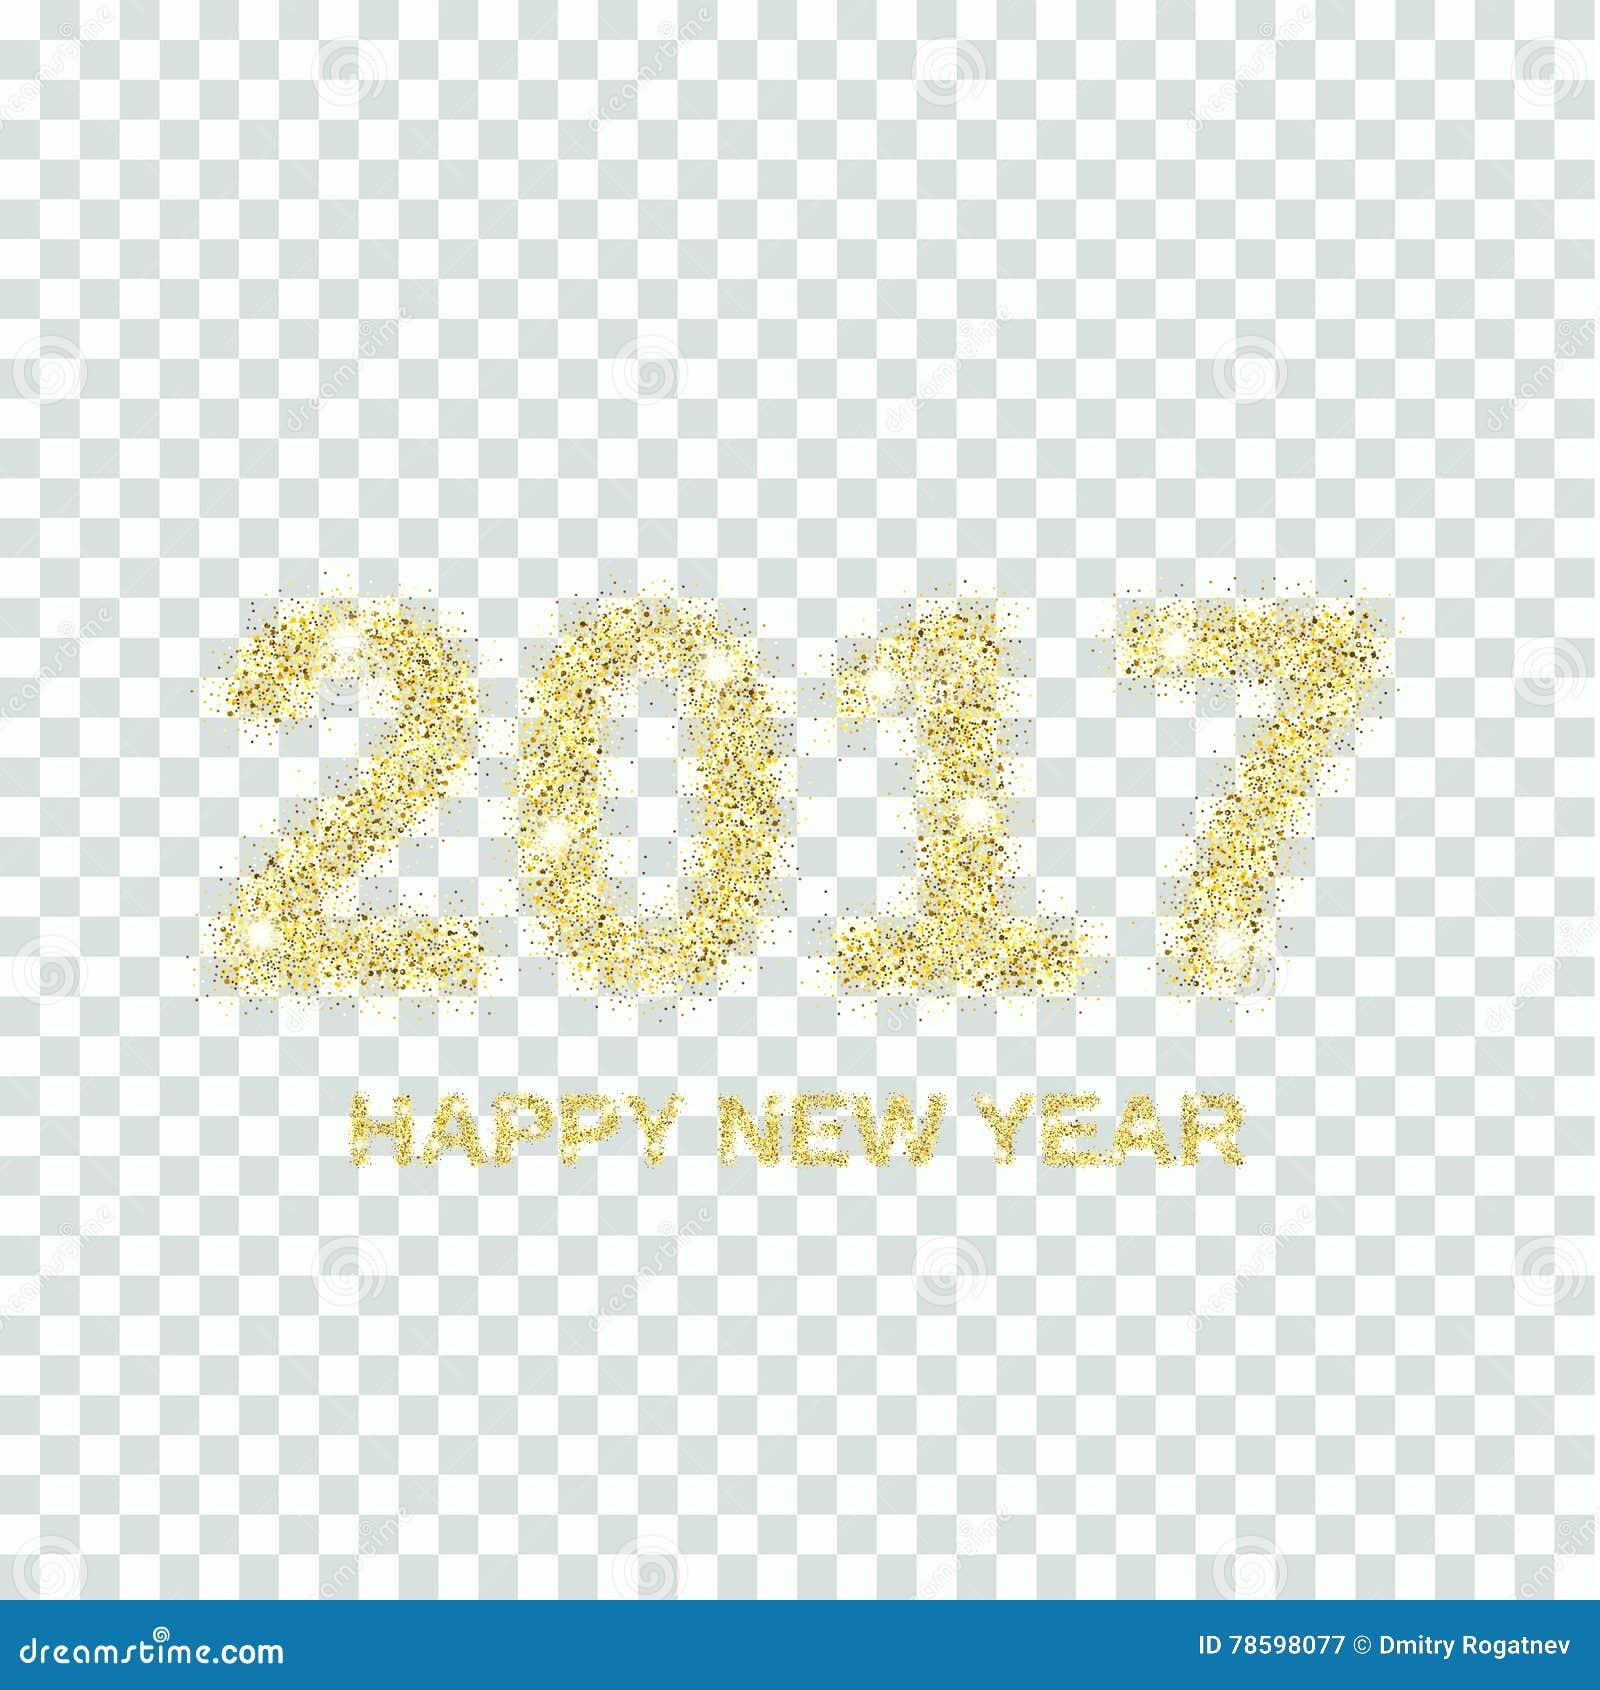 gold glitter happy new year 2017